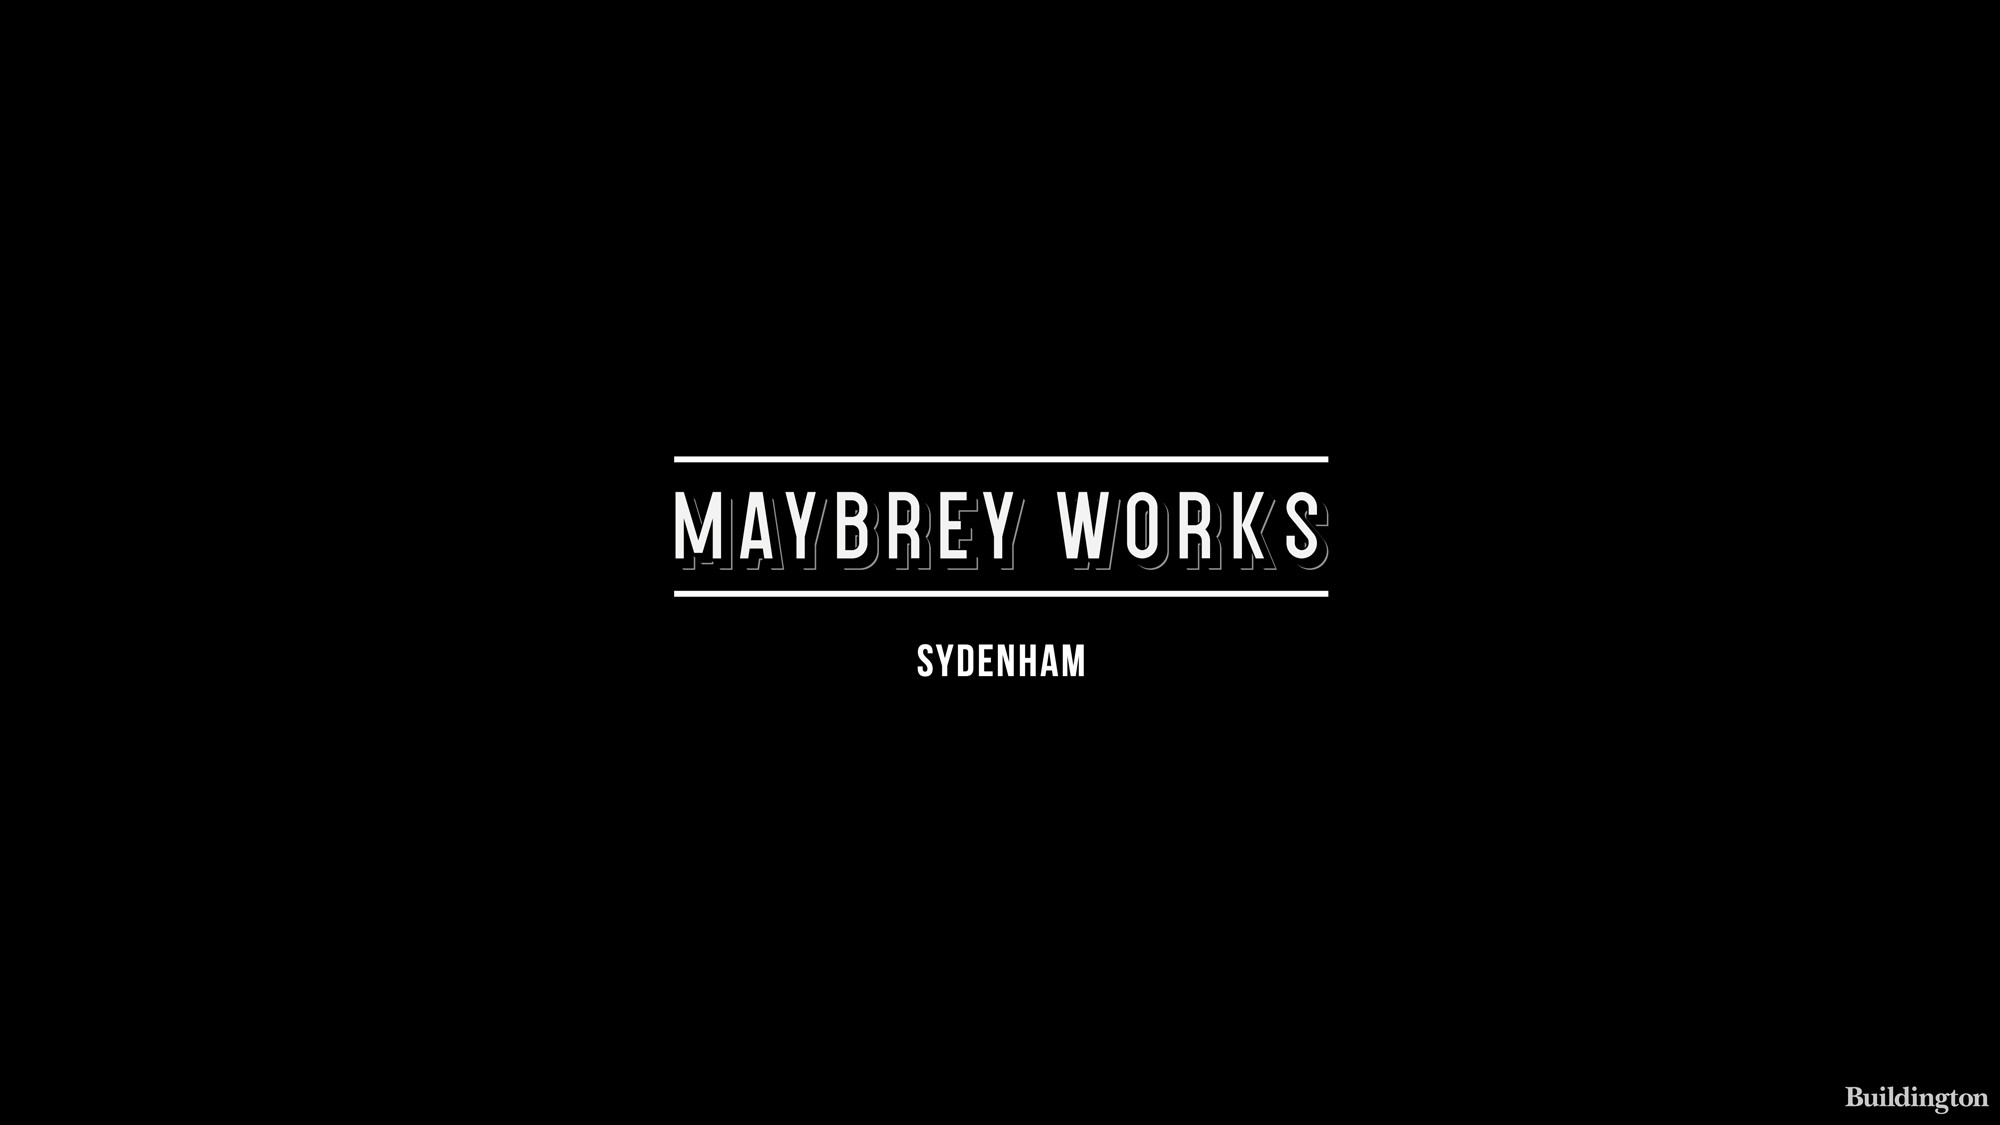 Maybrey Works by Bellway development logo.